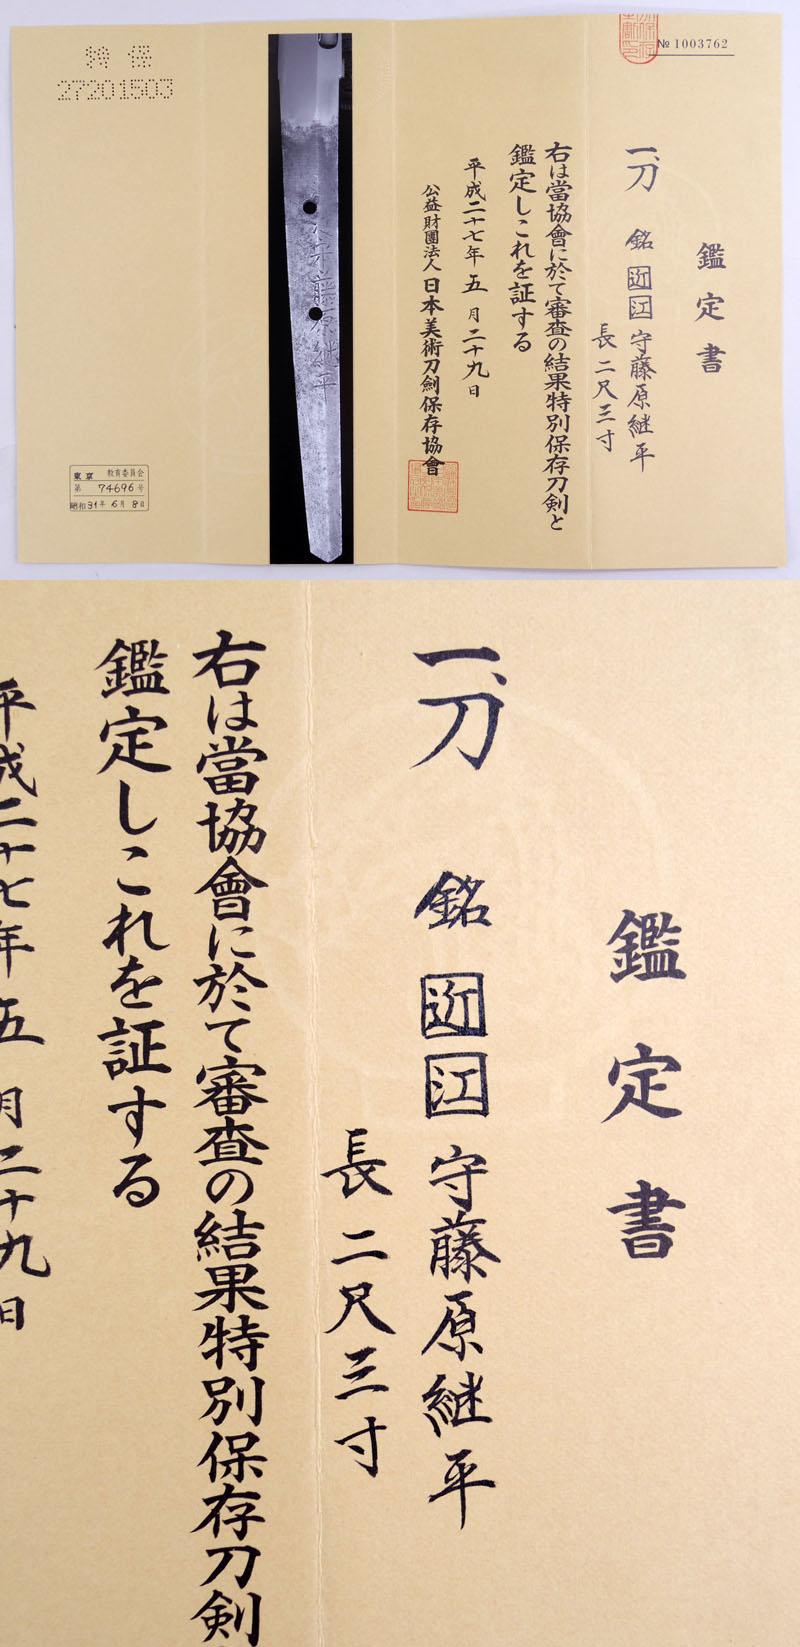 近江守藤原継平 Picture of Certificate